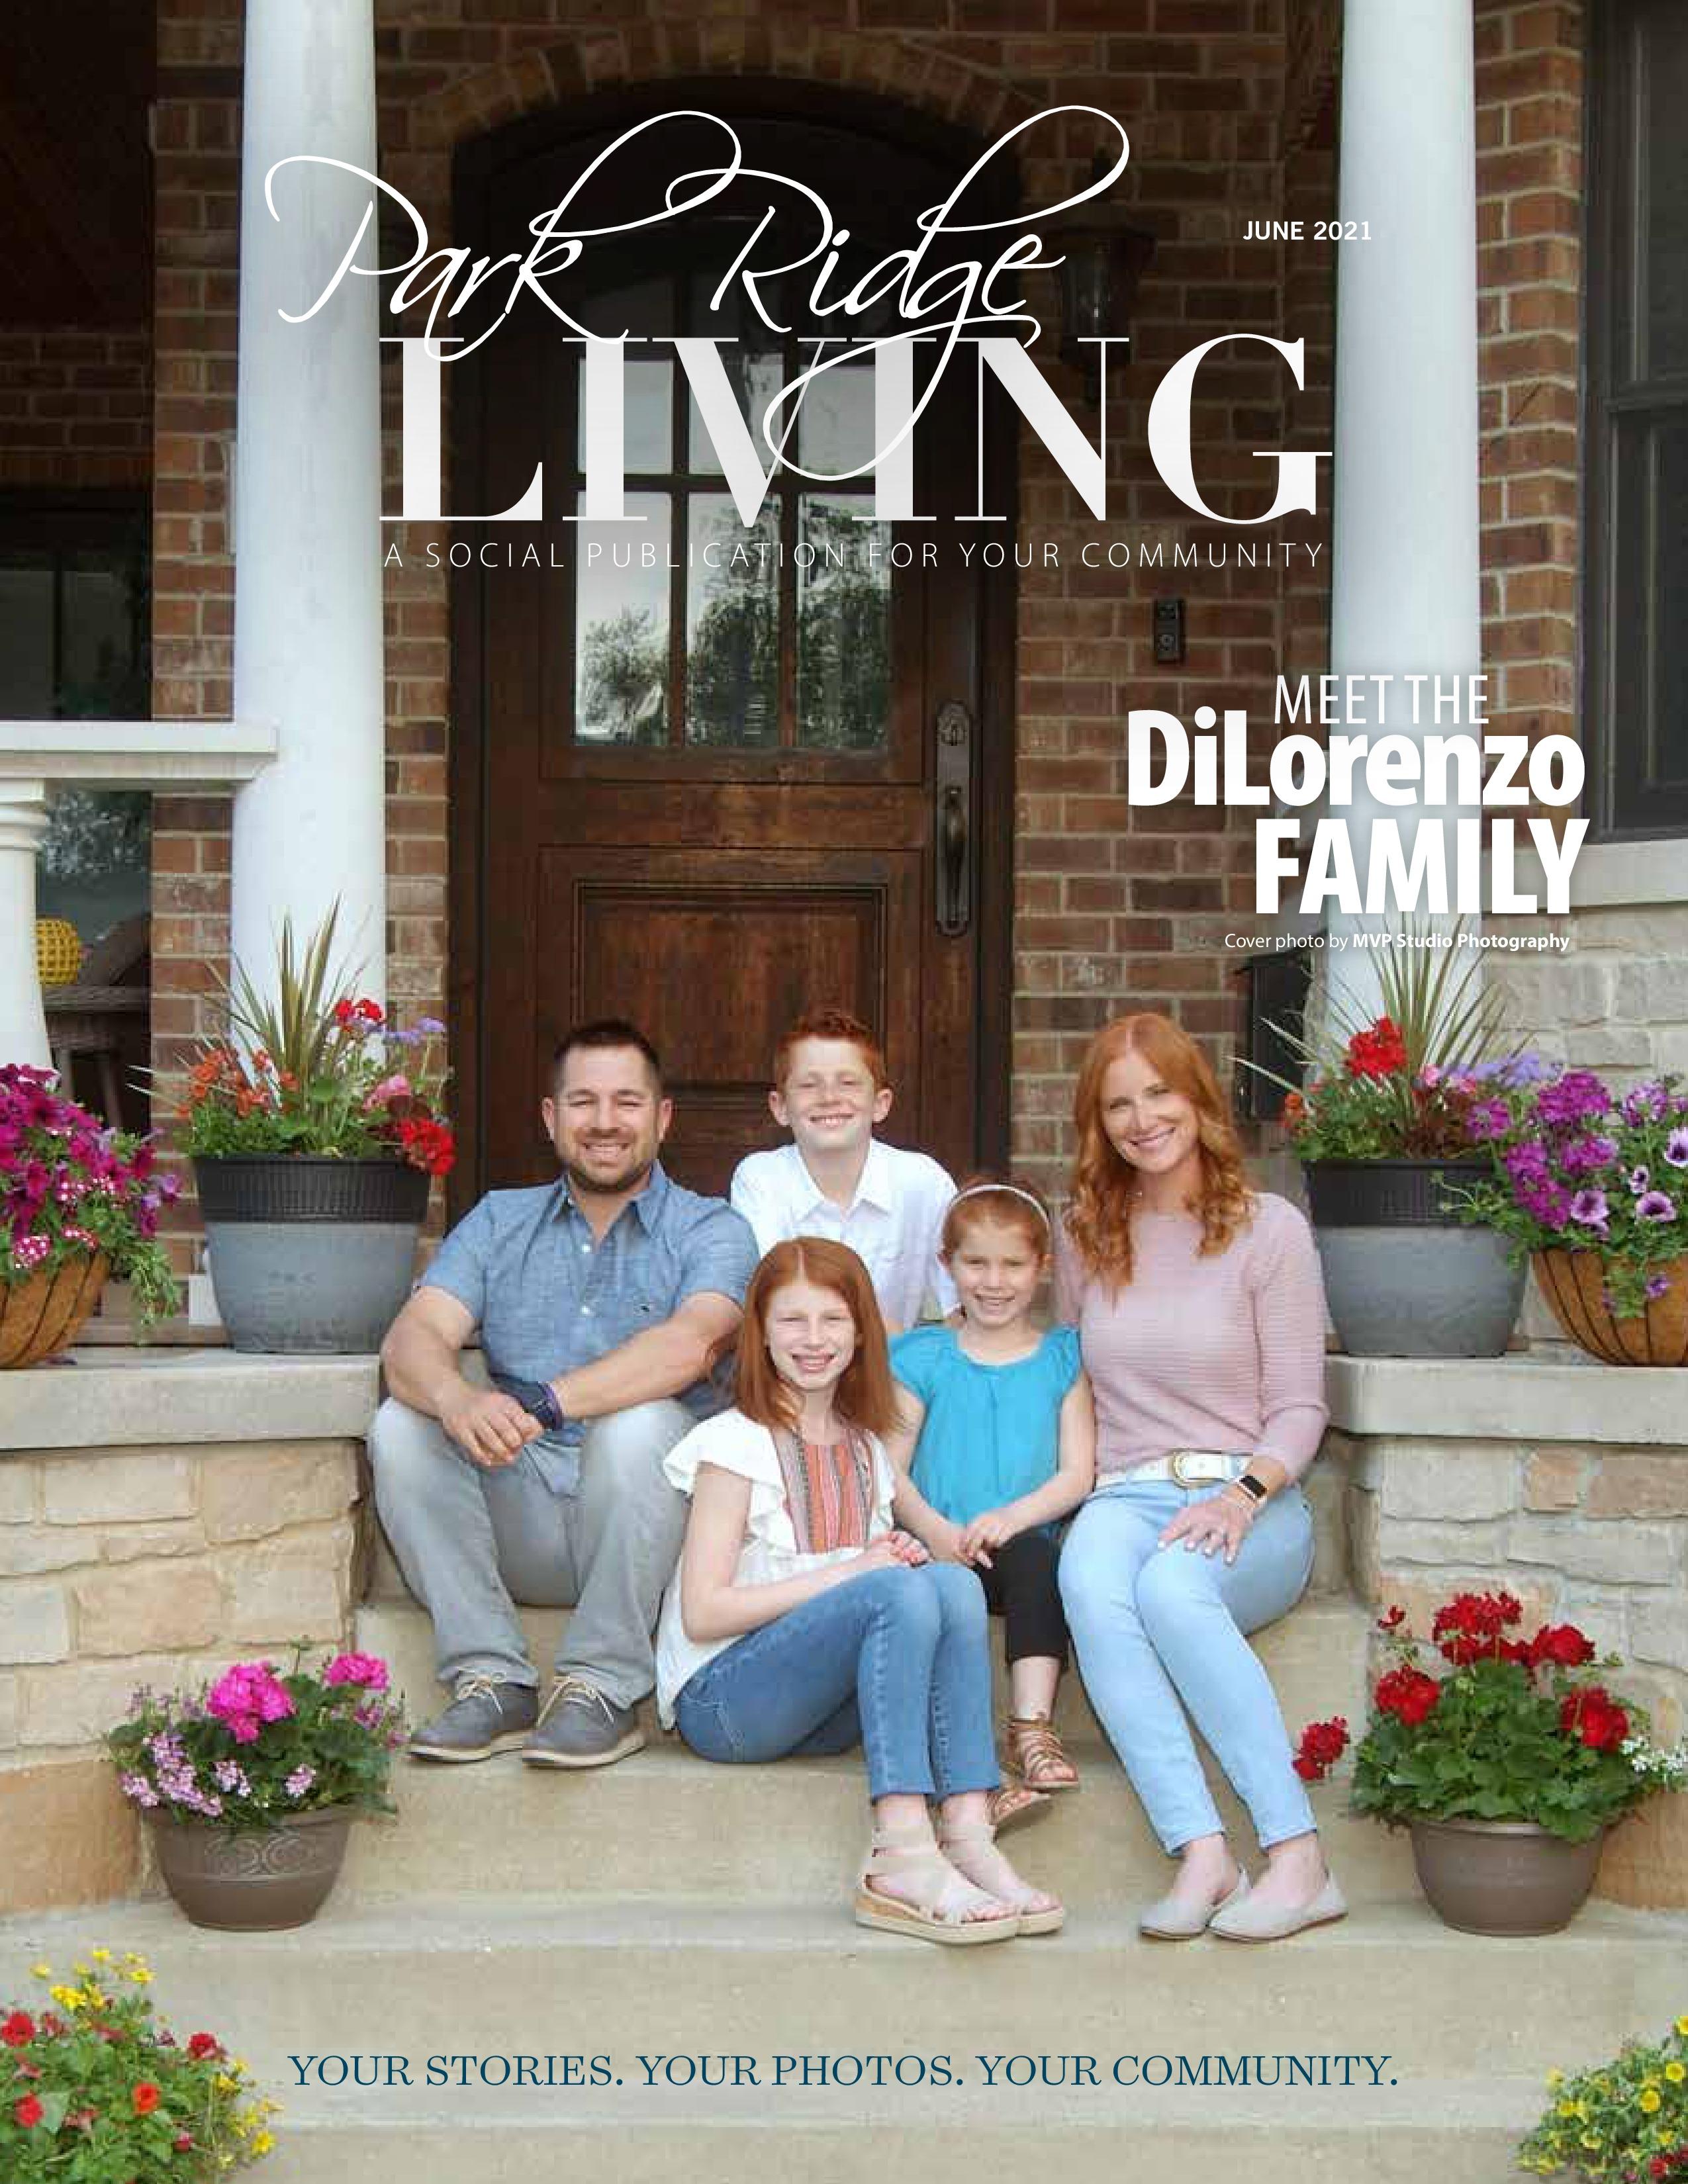 Park Ridge Living 2021-06-01